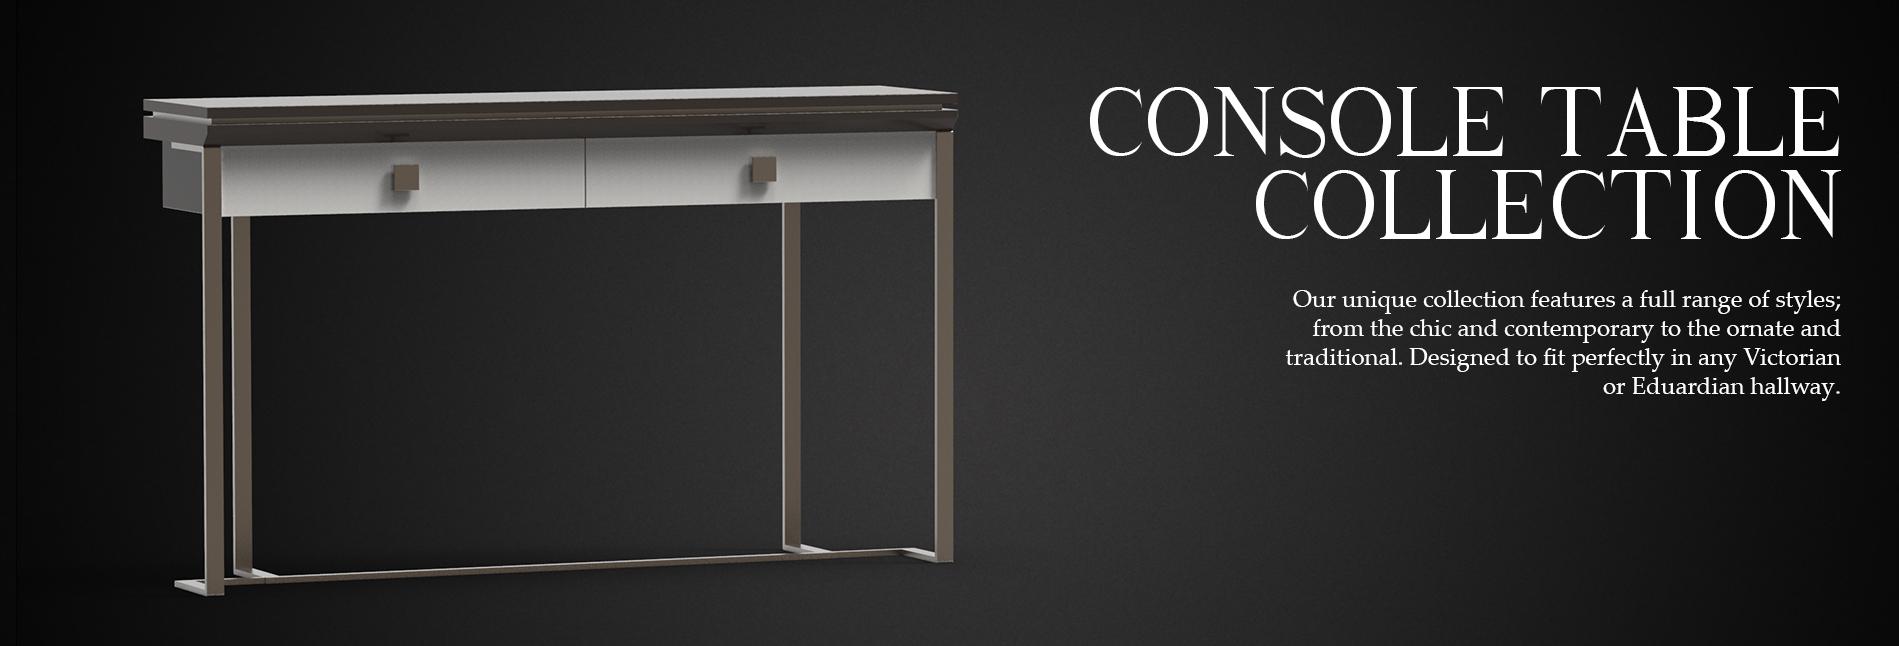 LFL-CONSOLE-TABLE-BANNER.jpg